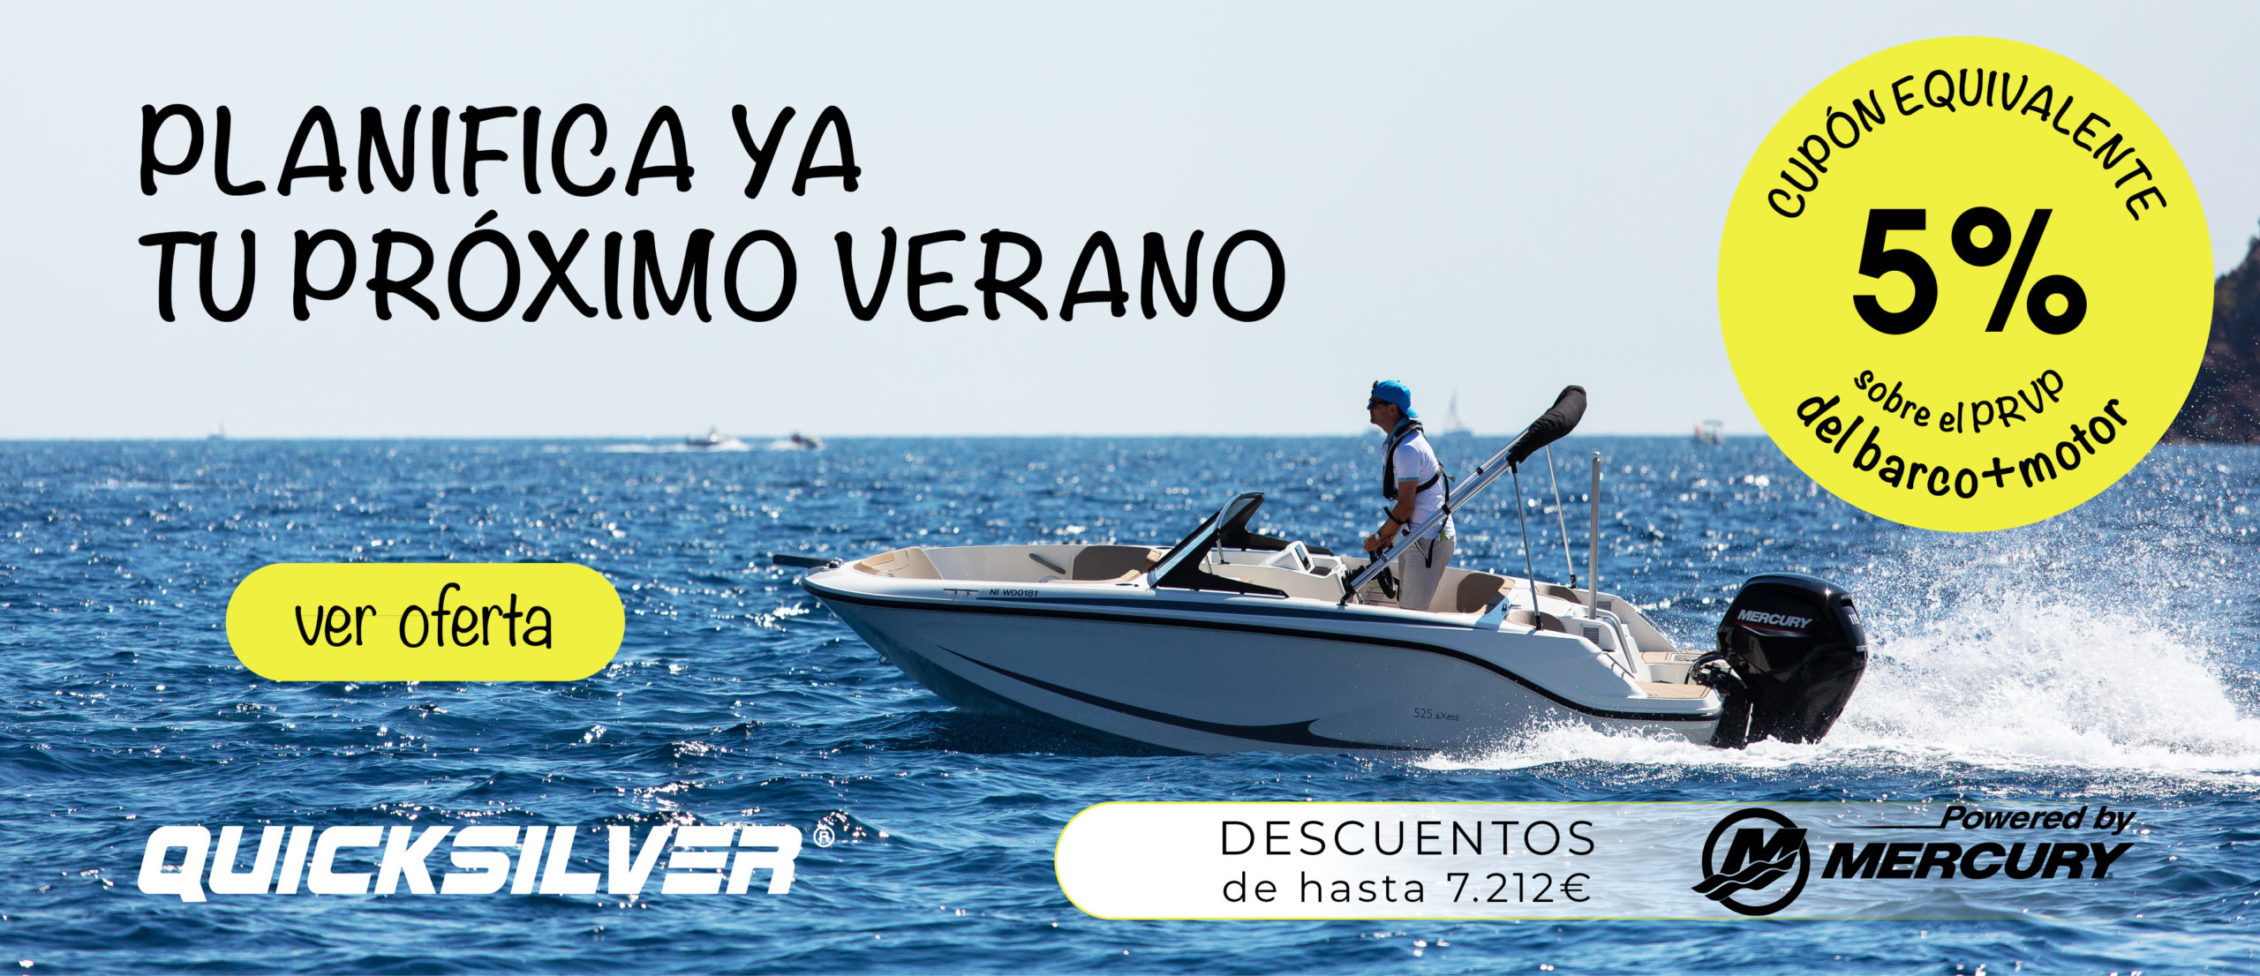 planifica prepara tu proximo verano oferta embarcacion barco quicksilver oferta salon nautico barcelona 2021 bayliner fueraborda mercury